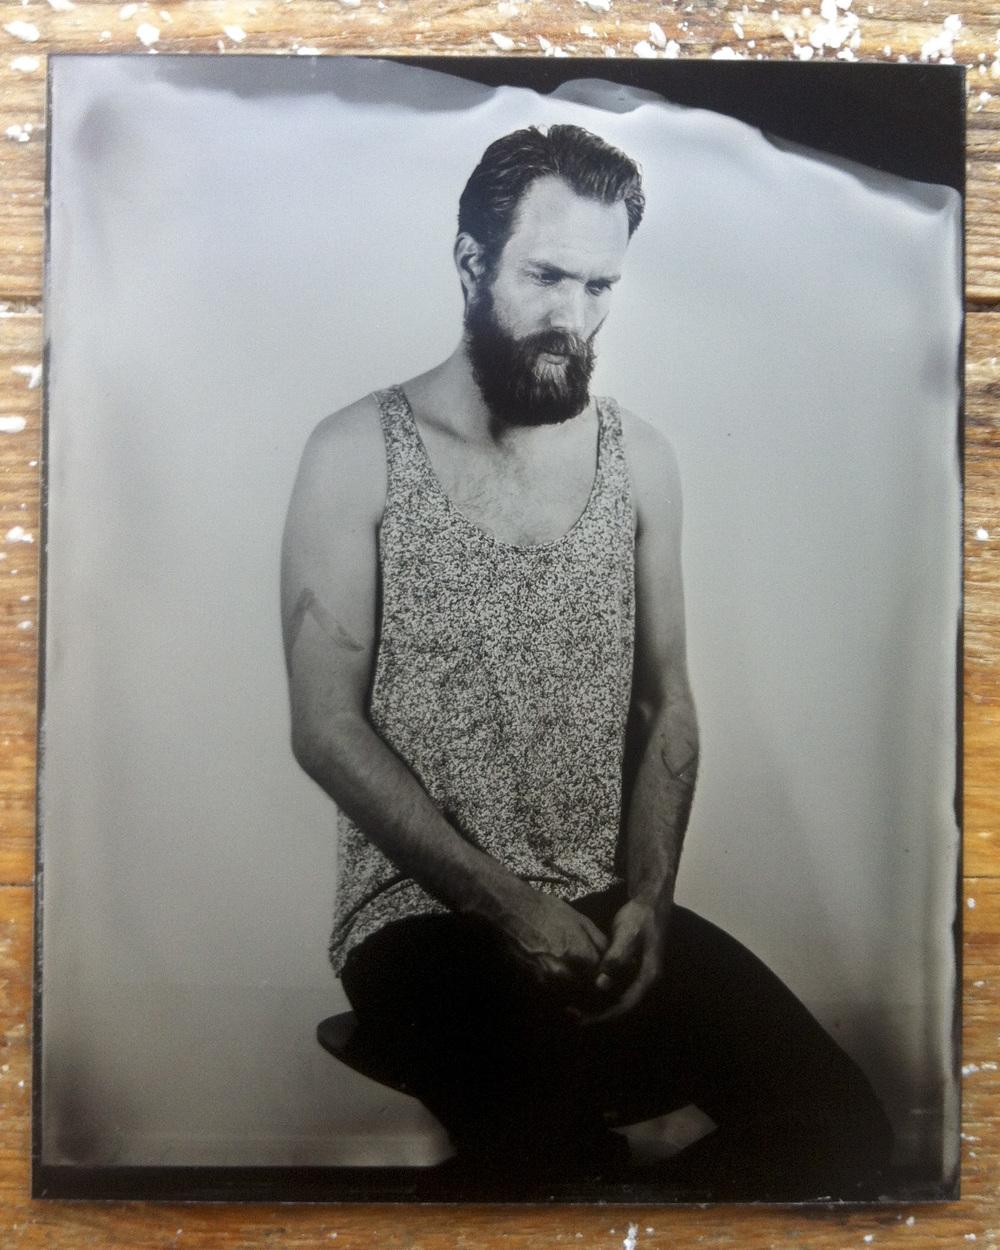 Jesper Frimann on wet plate collodion.